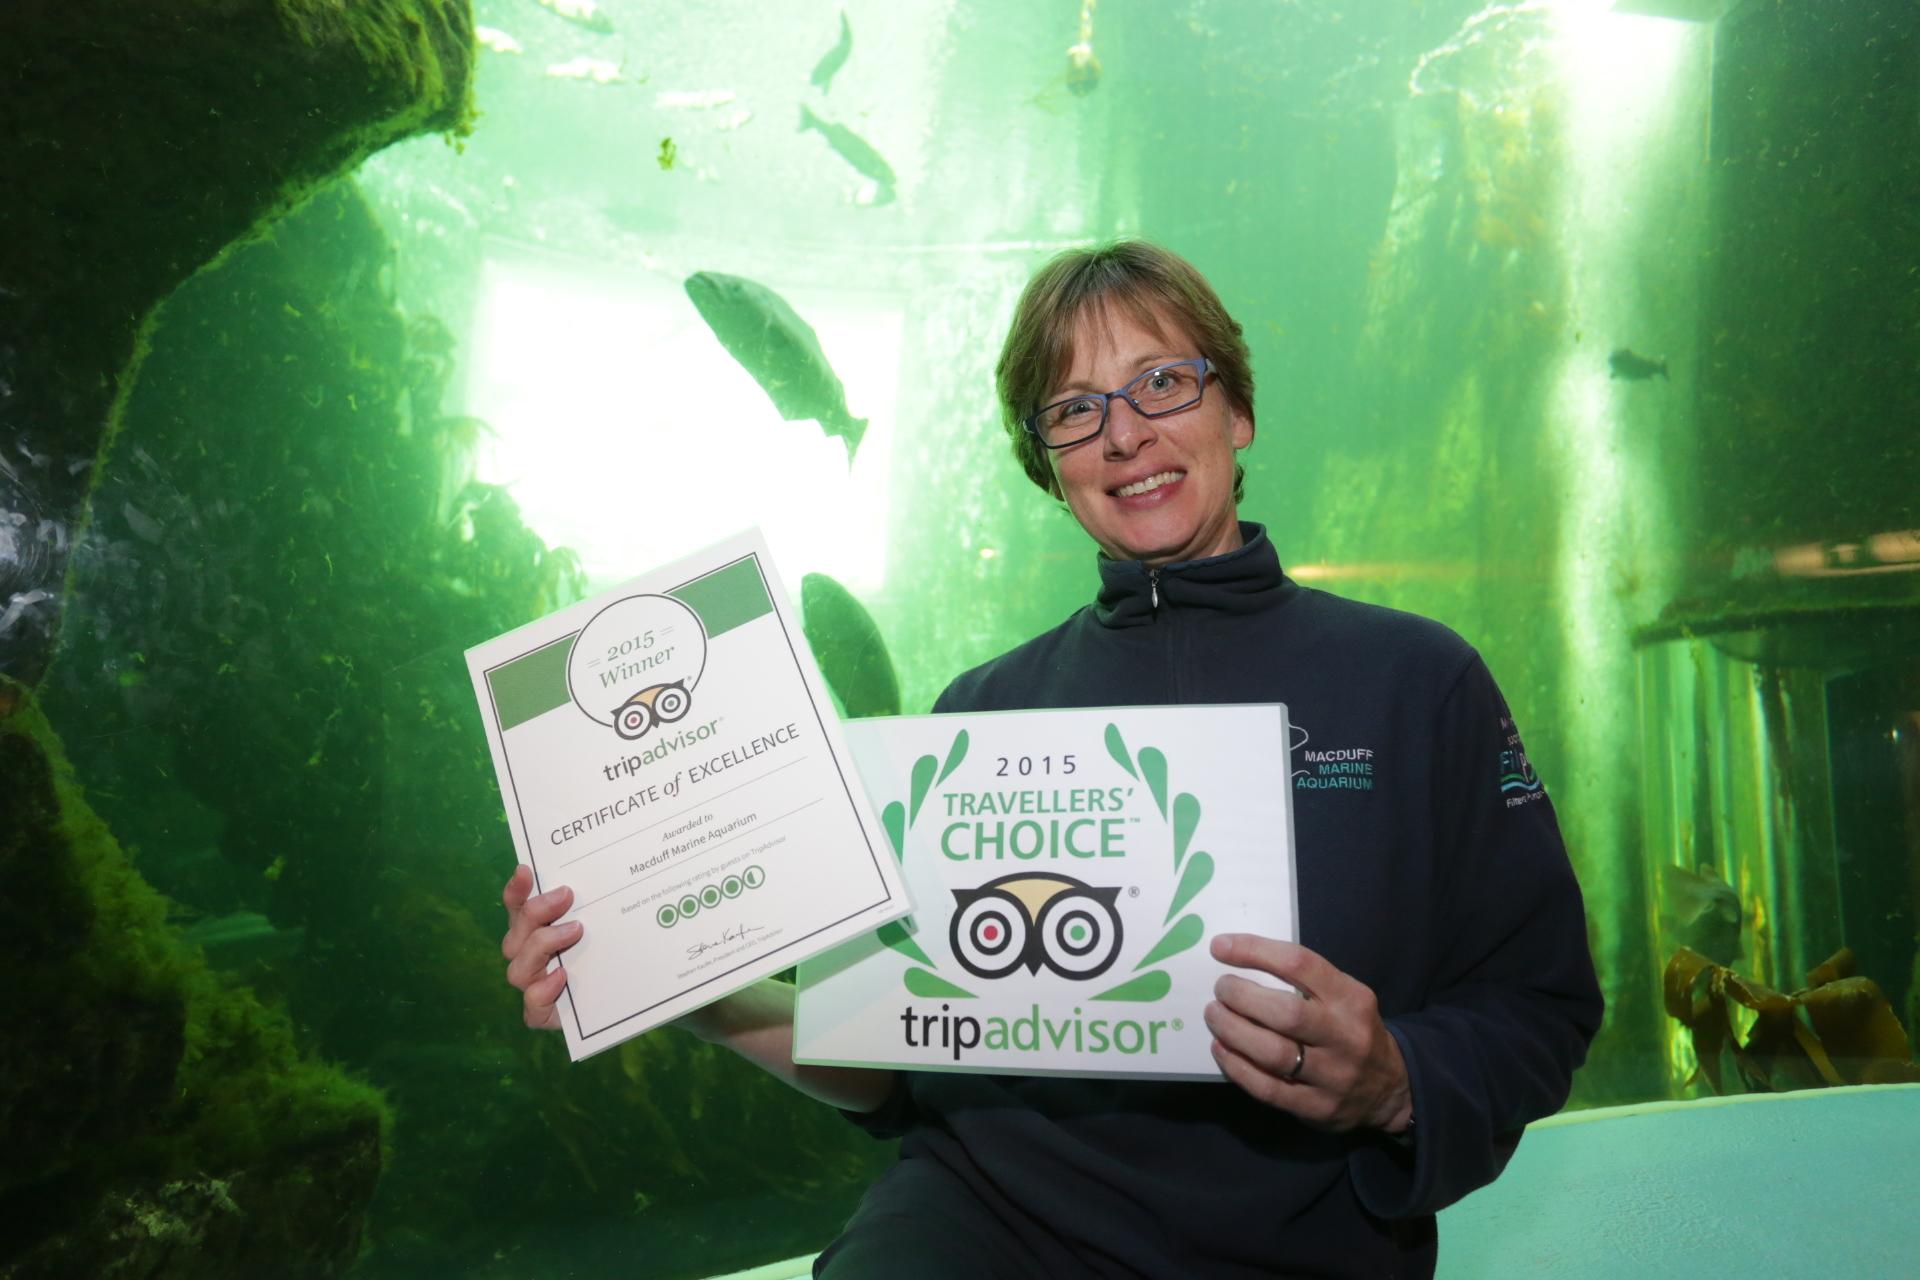 Claire Matthews, education officer for Macduff Marine Aquarium